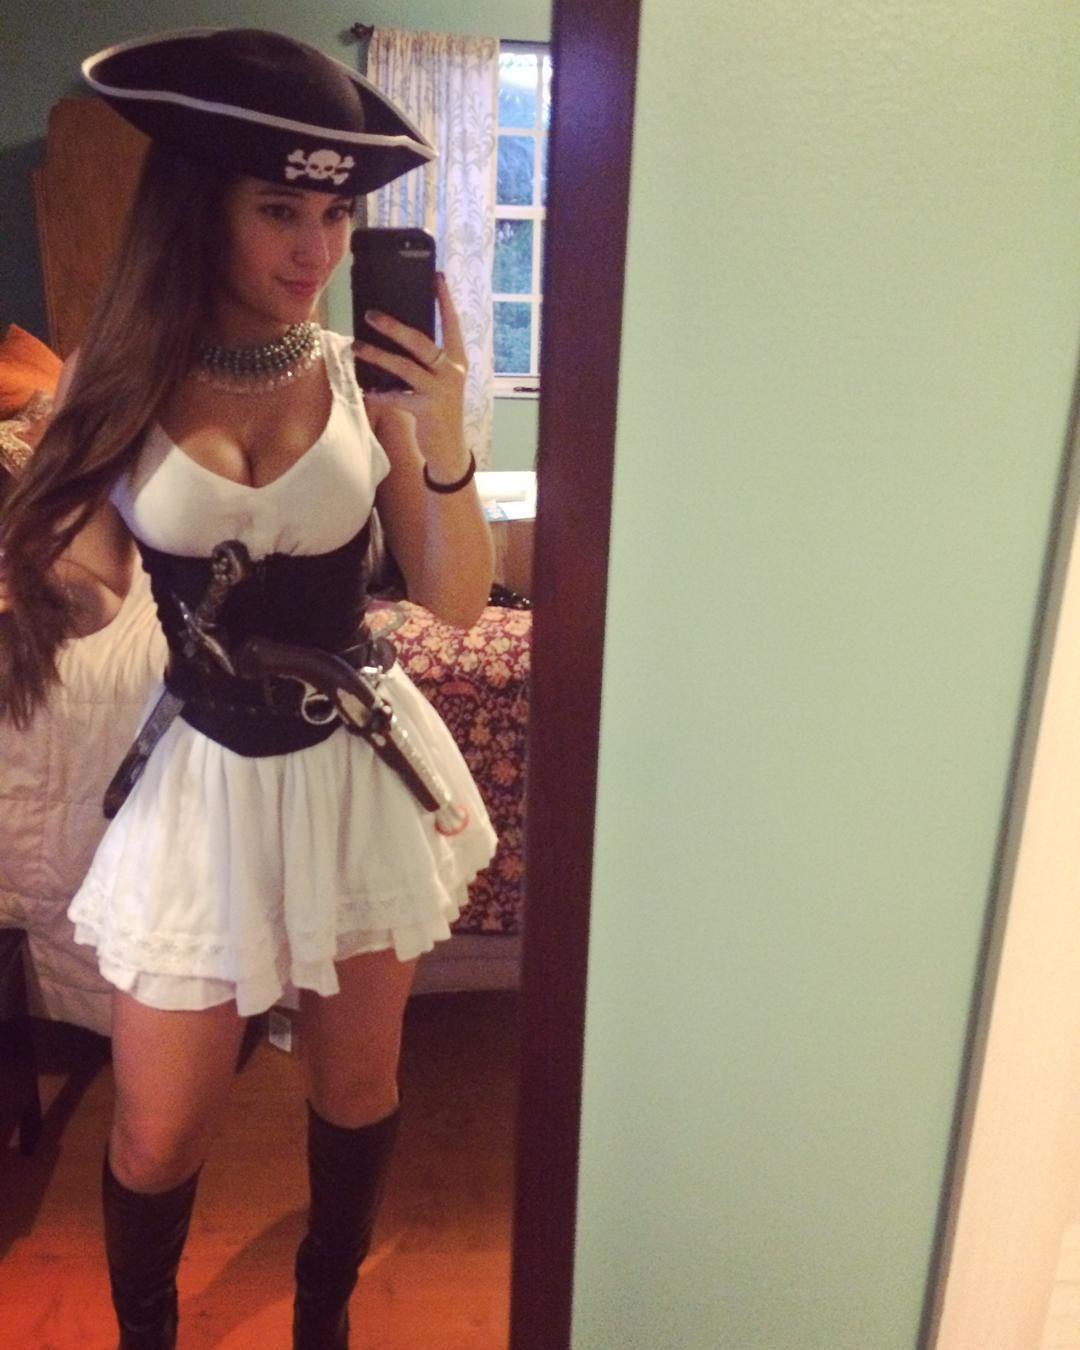 Selfie Angeline Varona nude (82 photo), Ass, Sideboobs, Feet, swimsuit 2019